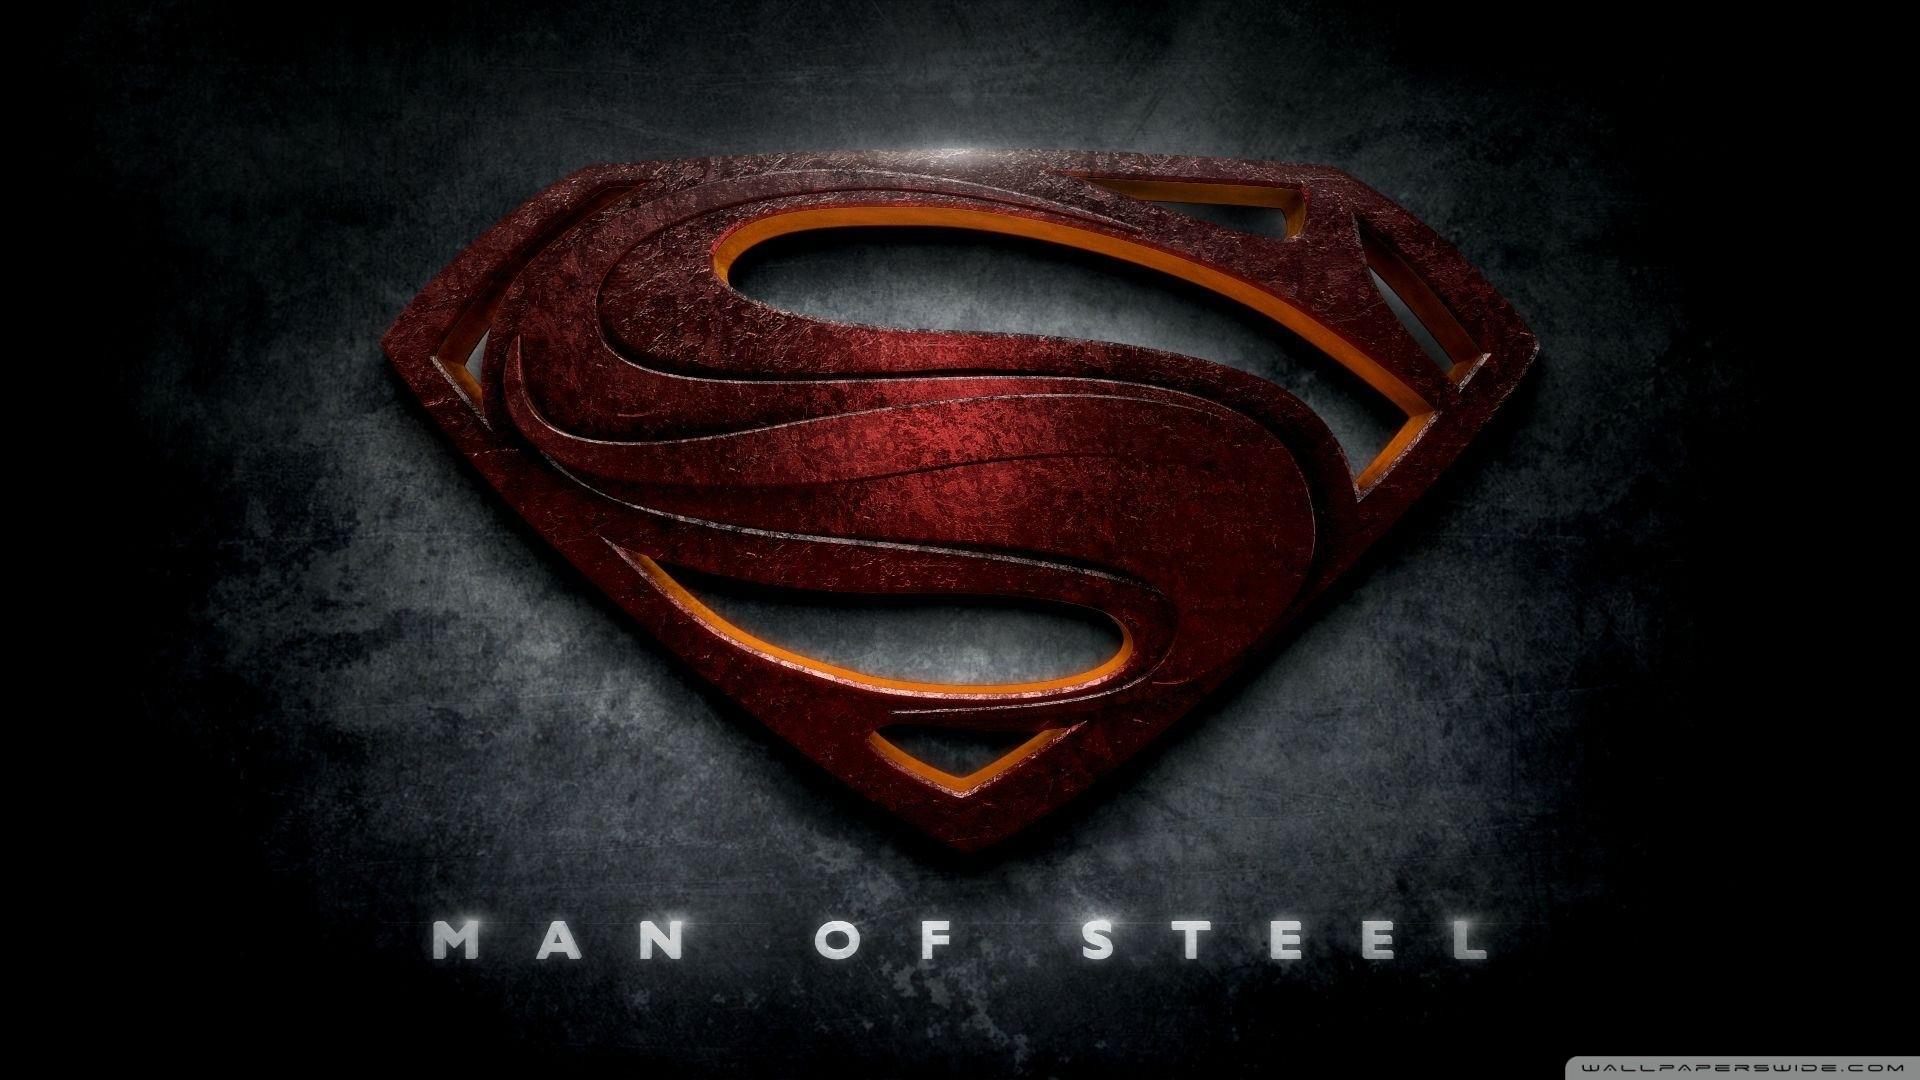 Best 25+ Superman hd wallpaper ideas on Pinterest | Superman logo, Superman  logo wallpaper and Superman logo art